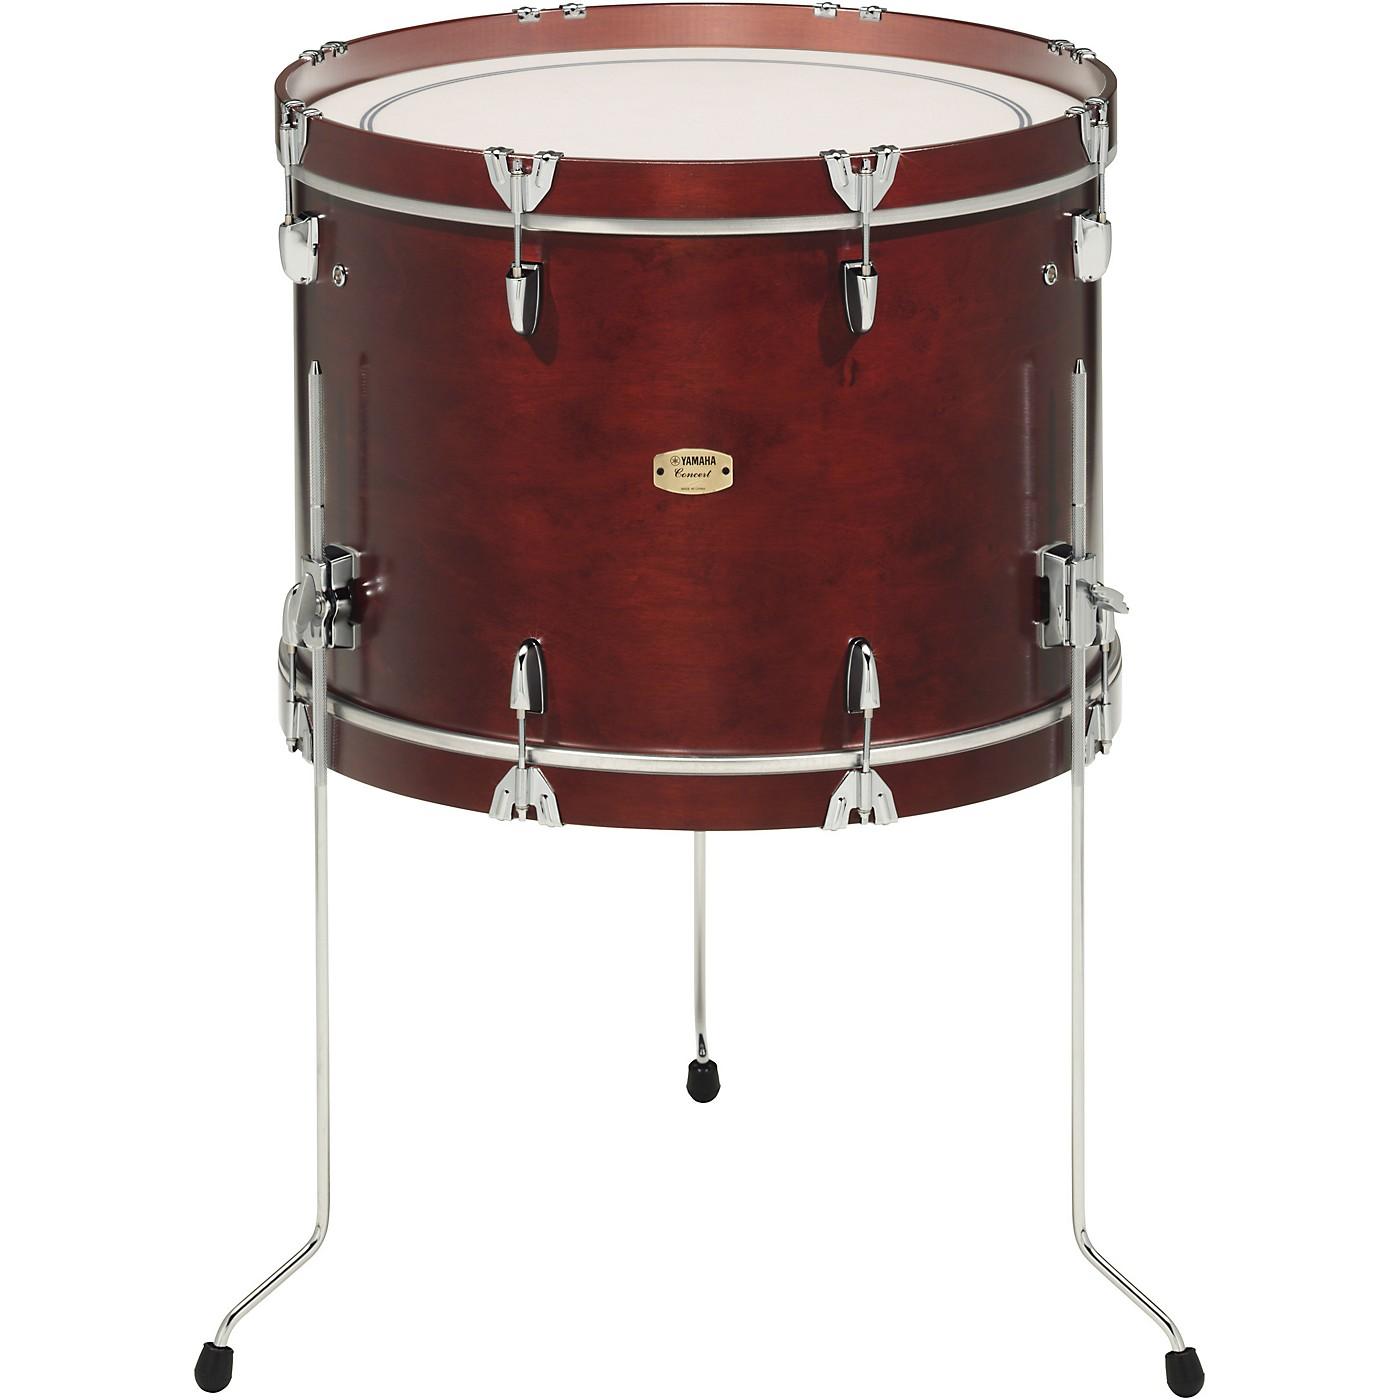 Yamaha FB-9000 Series Impact Drums thumbnail